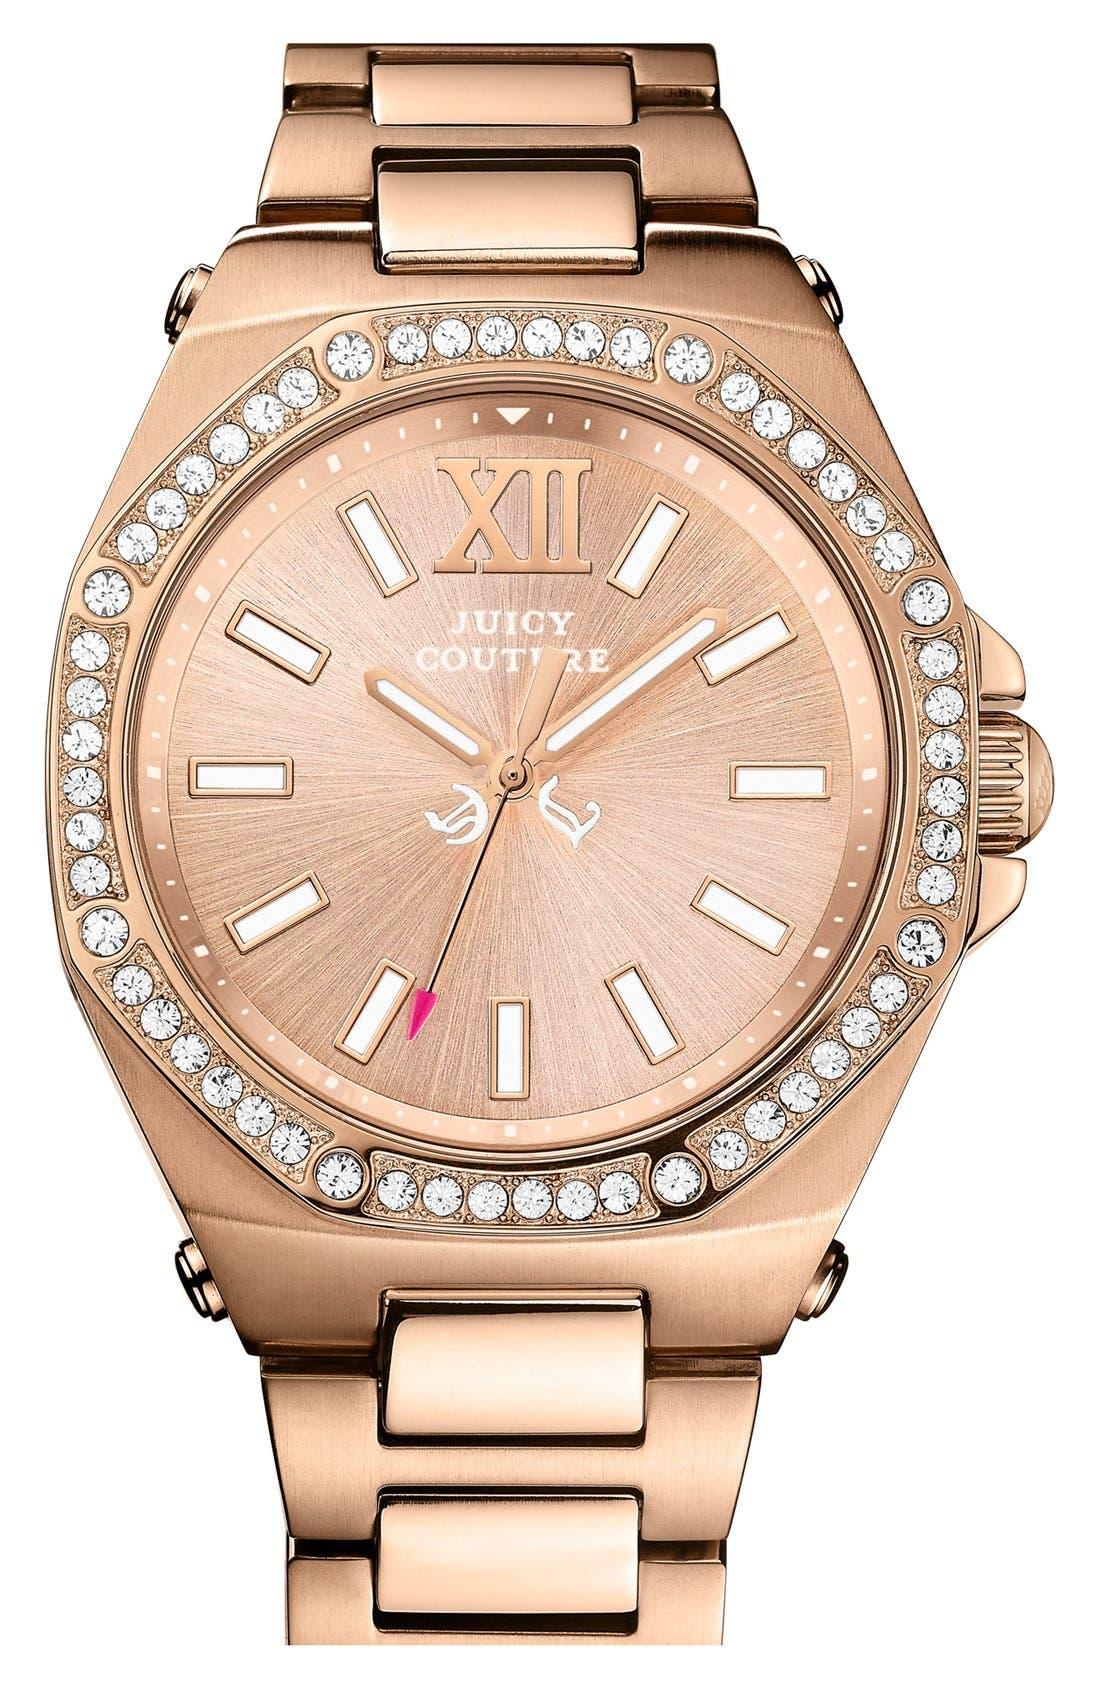 Alternate Image 1 Selected - Juicy Couture 'Chelsea' Octagonal Bracelet Watch, 42mm